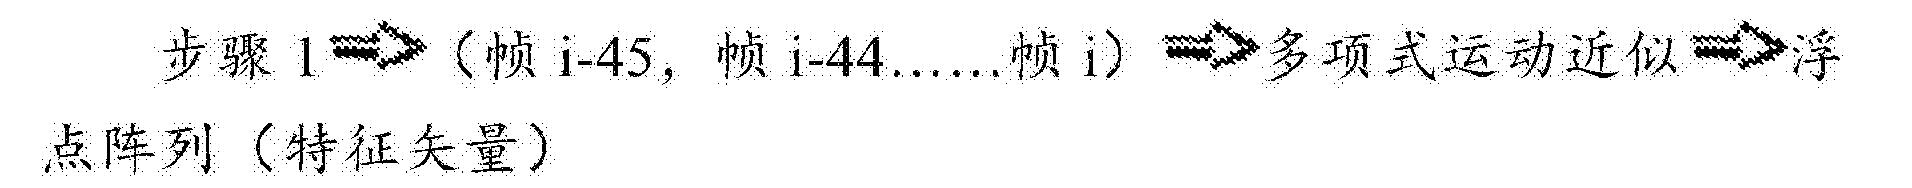 Figure CN106462725AD00412